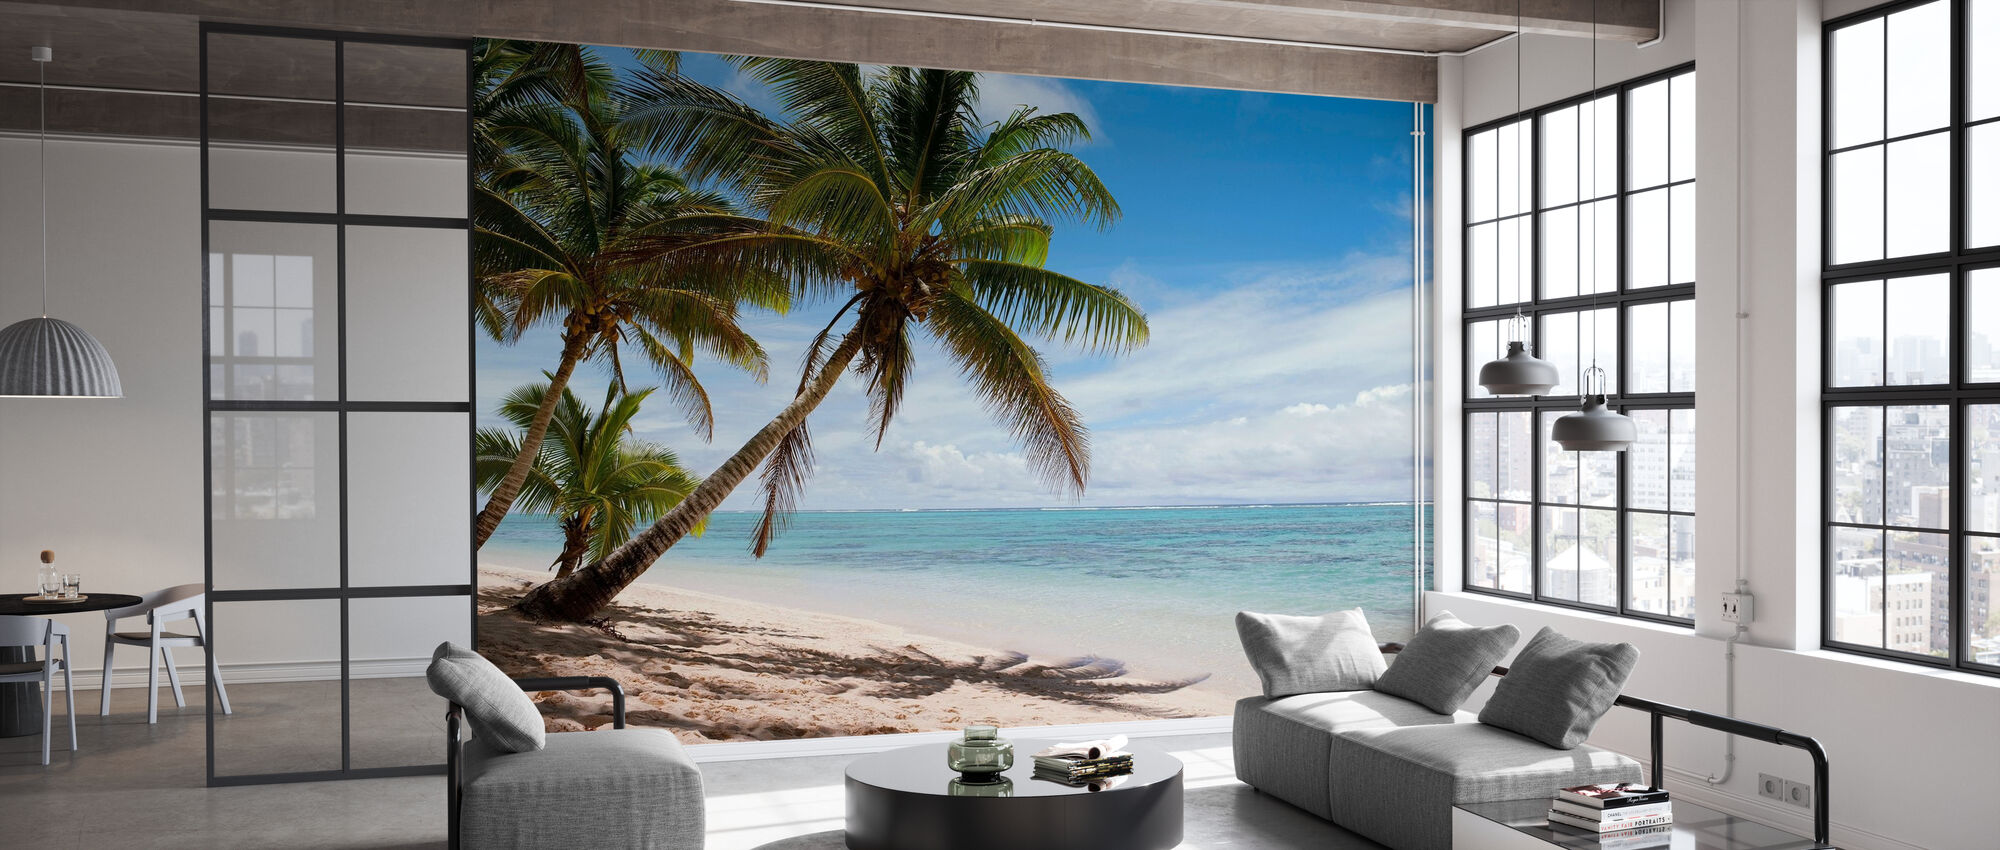 Tropical Beach Scene - Wallpaper - Office